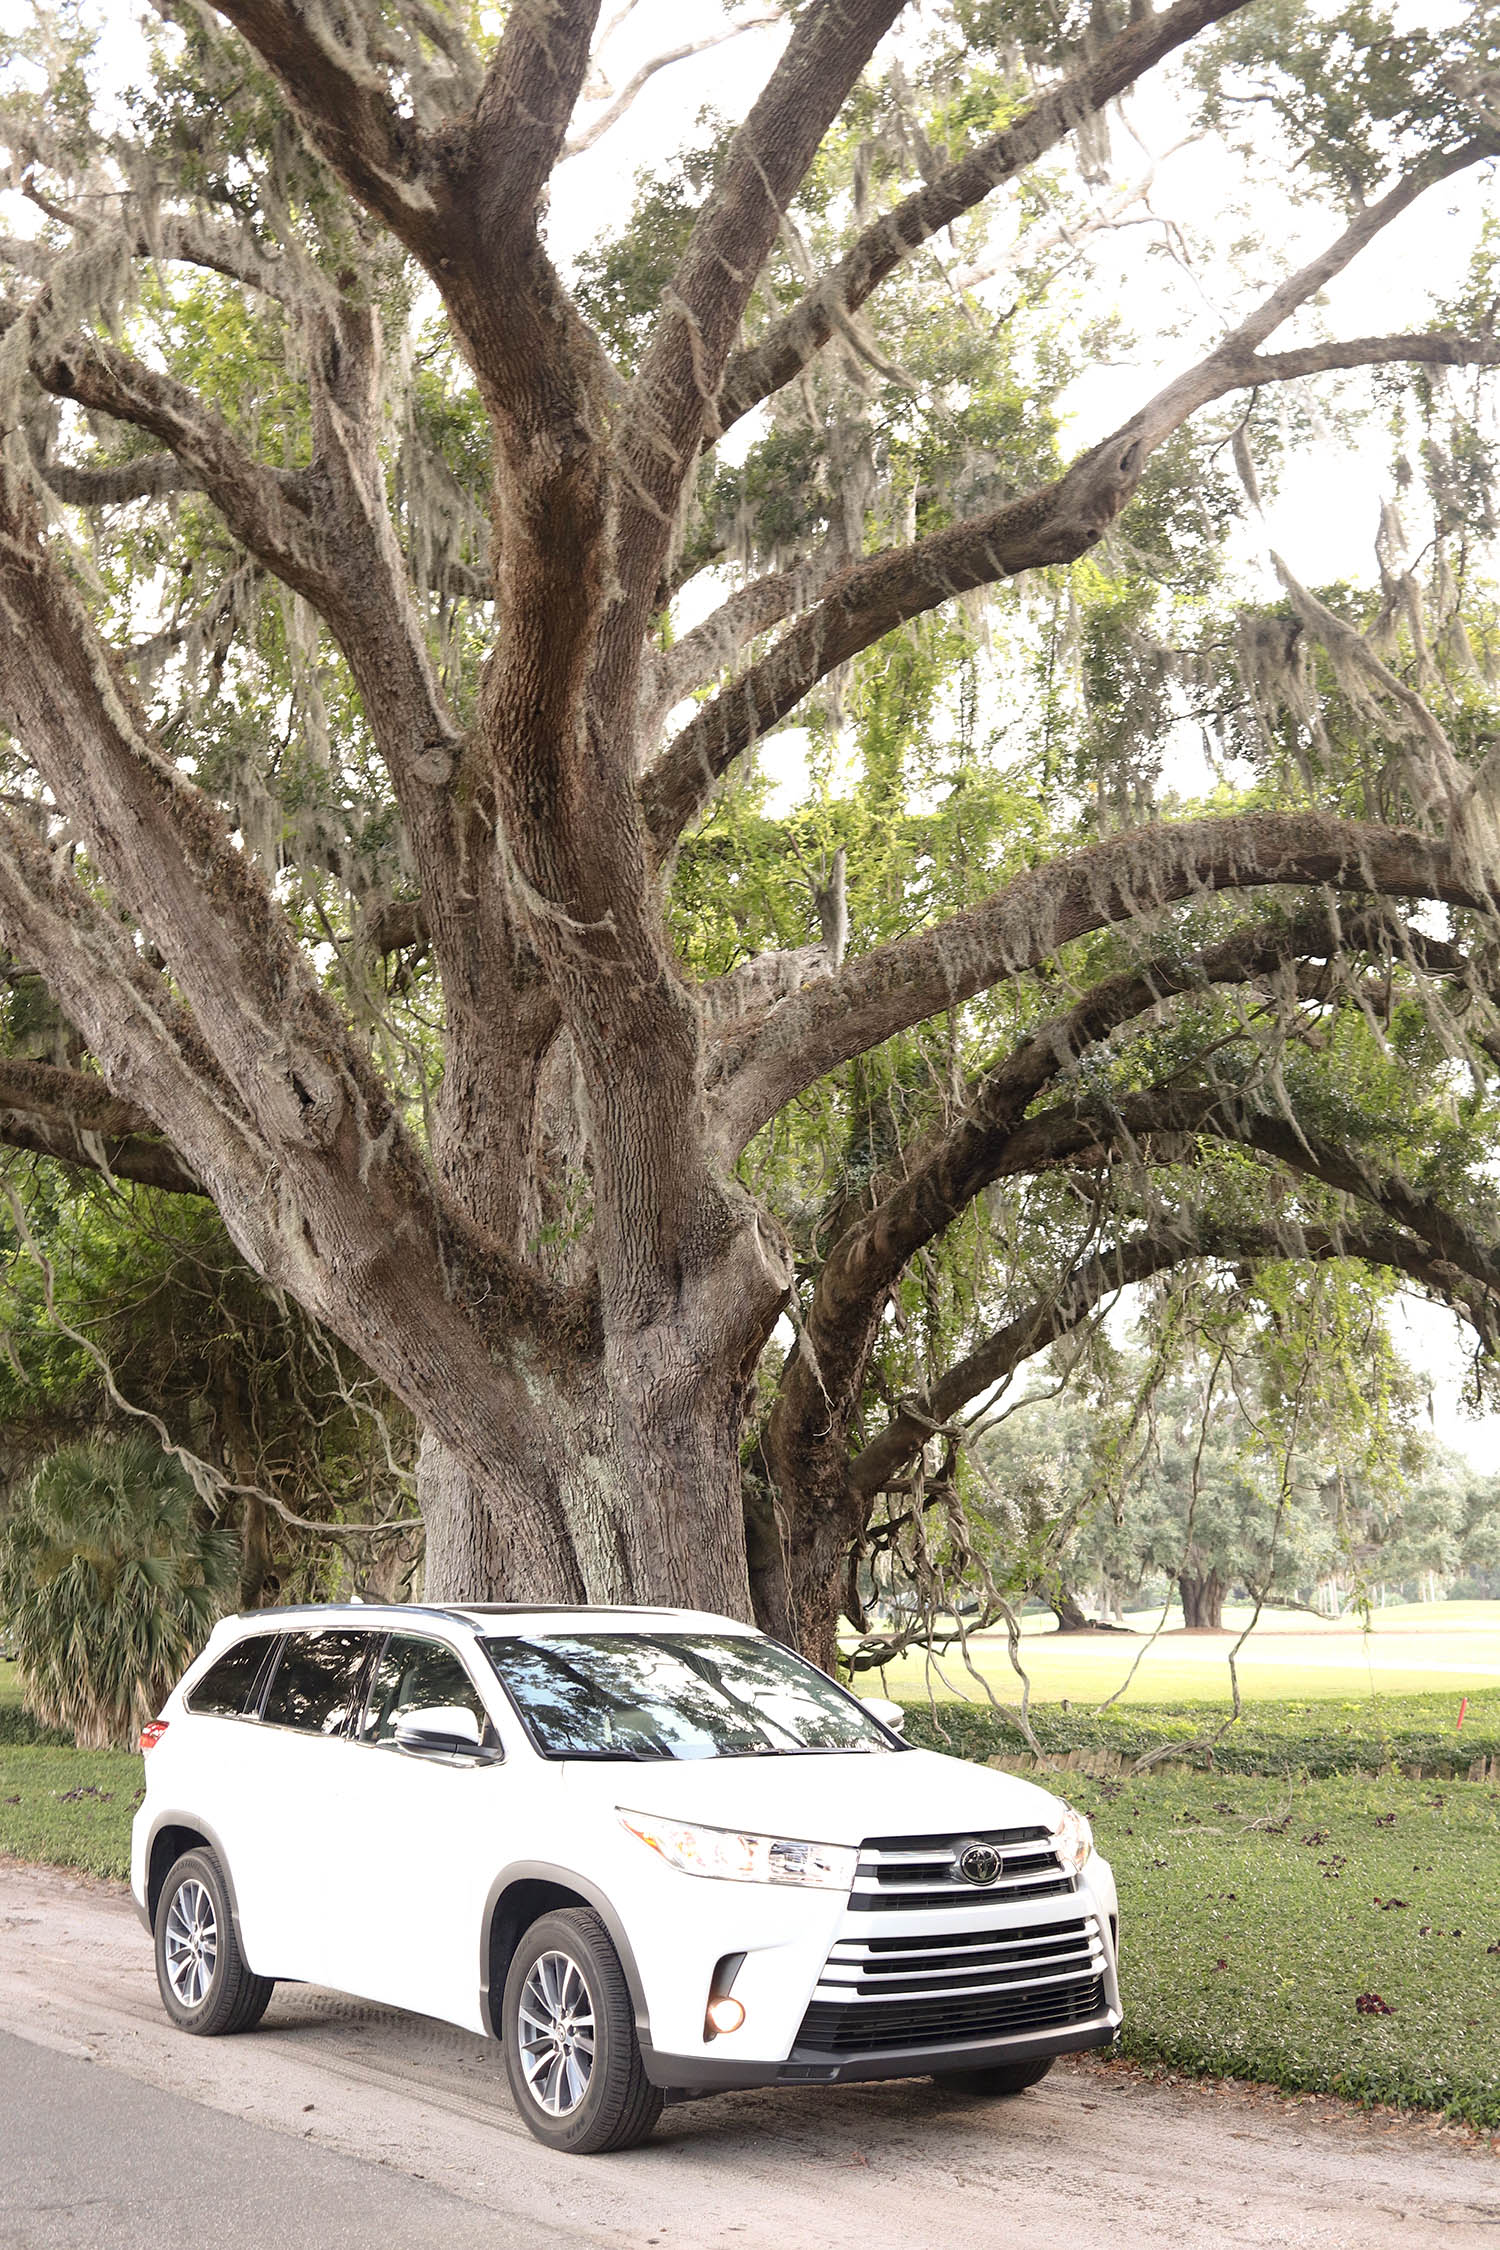 2018 Toyota Highlander - St Simons Island